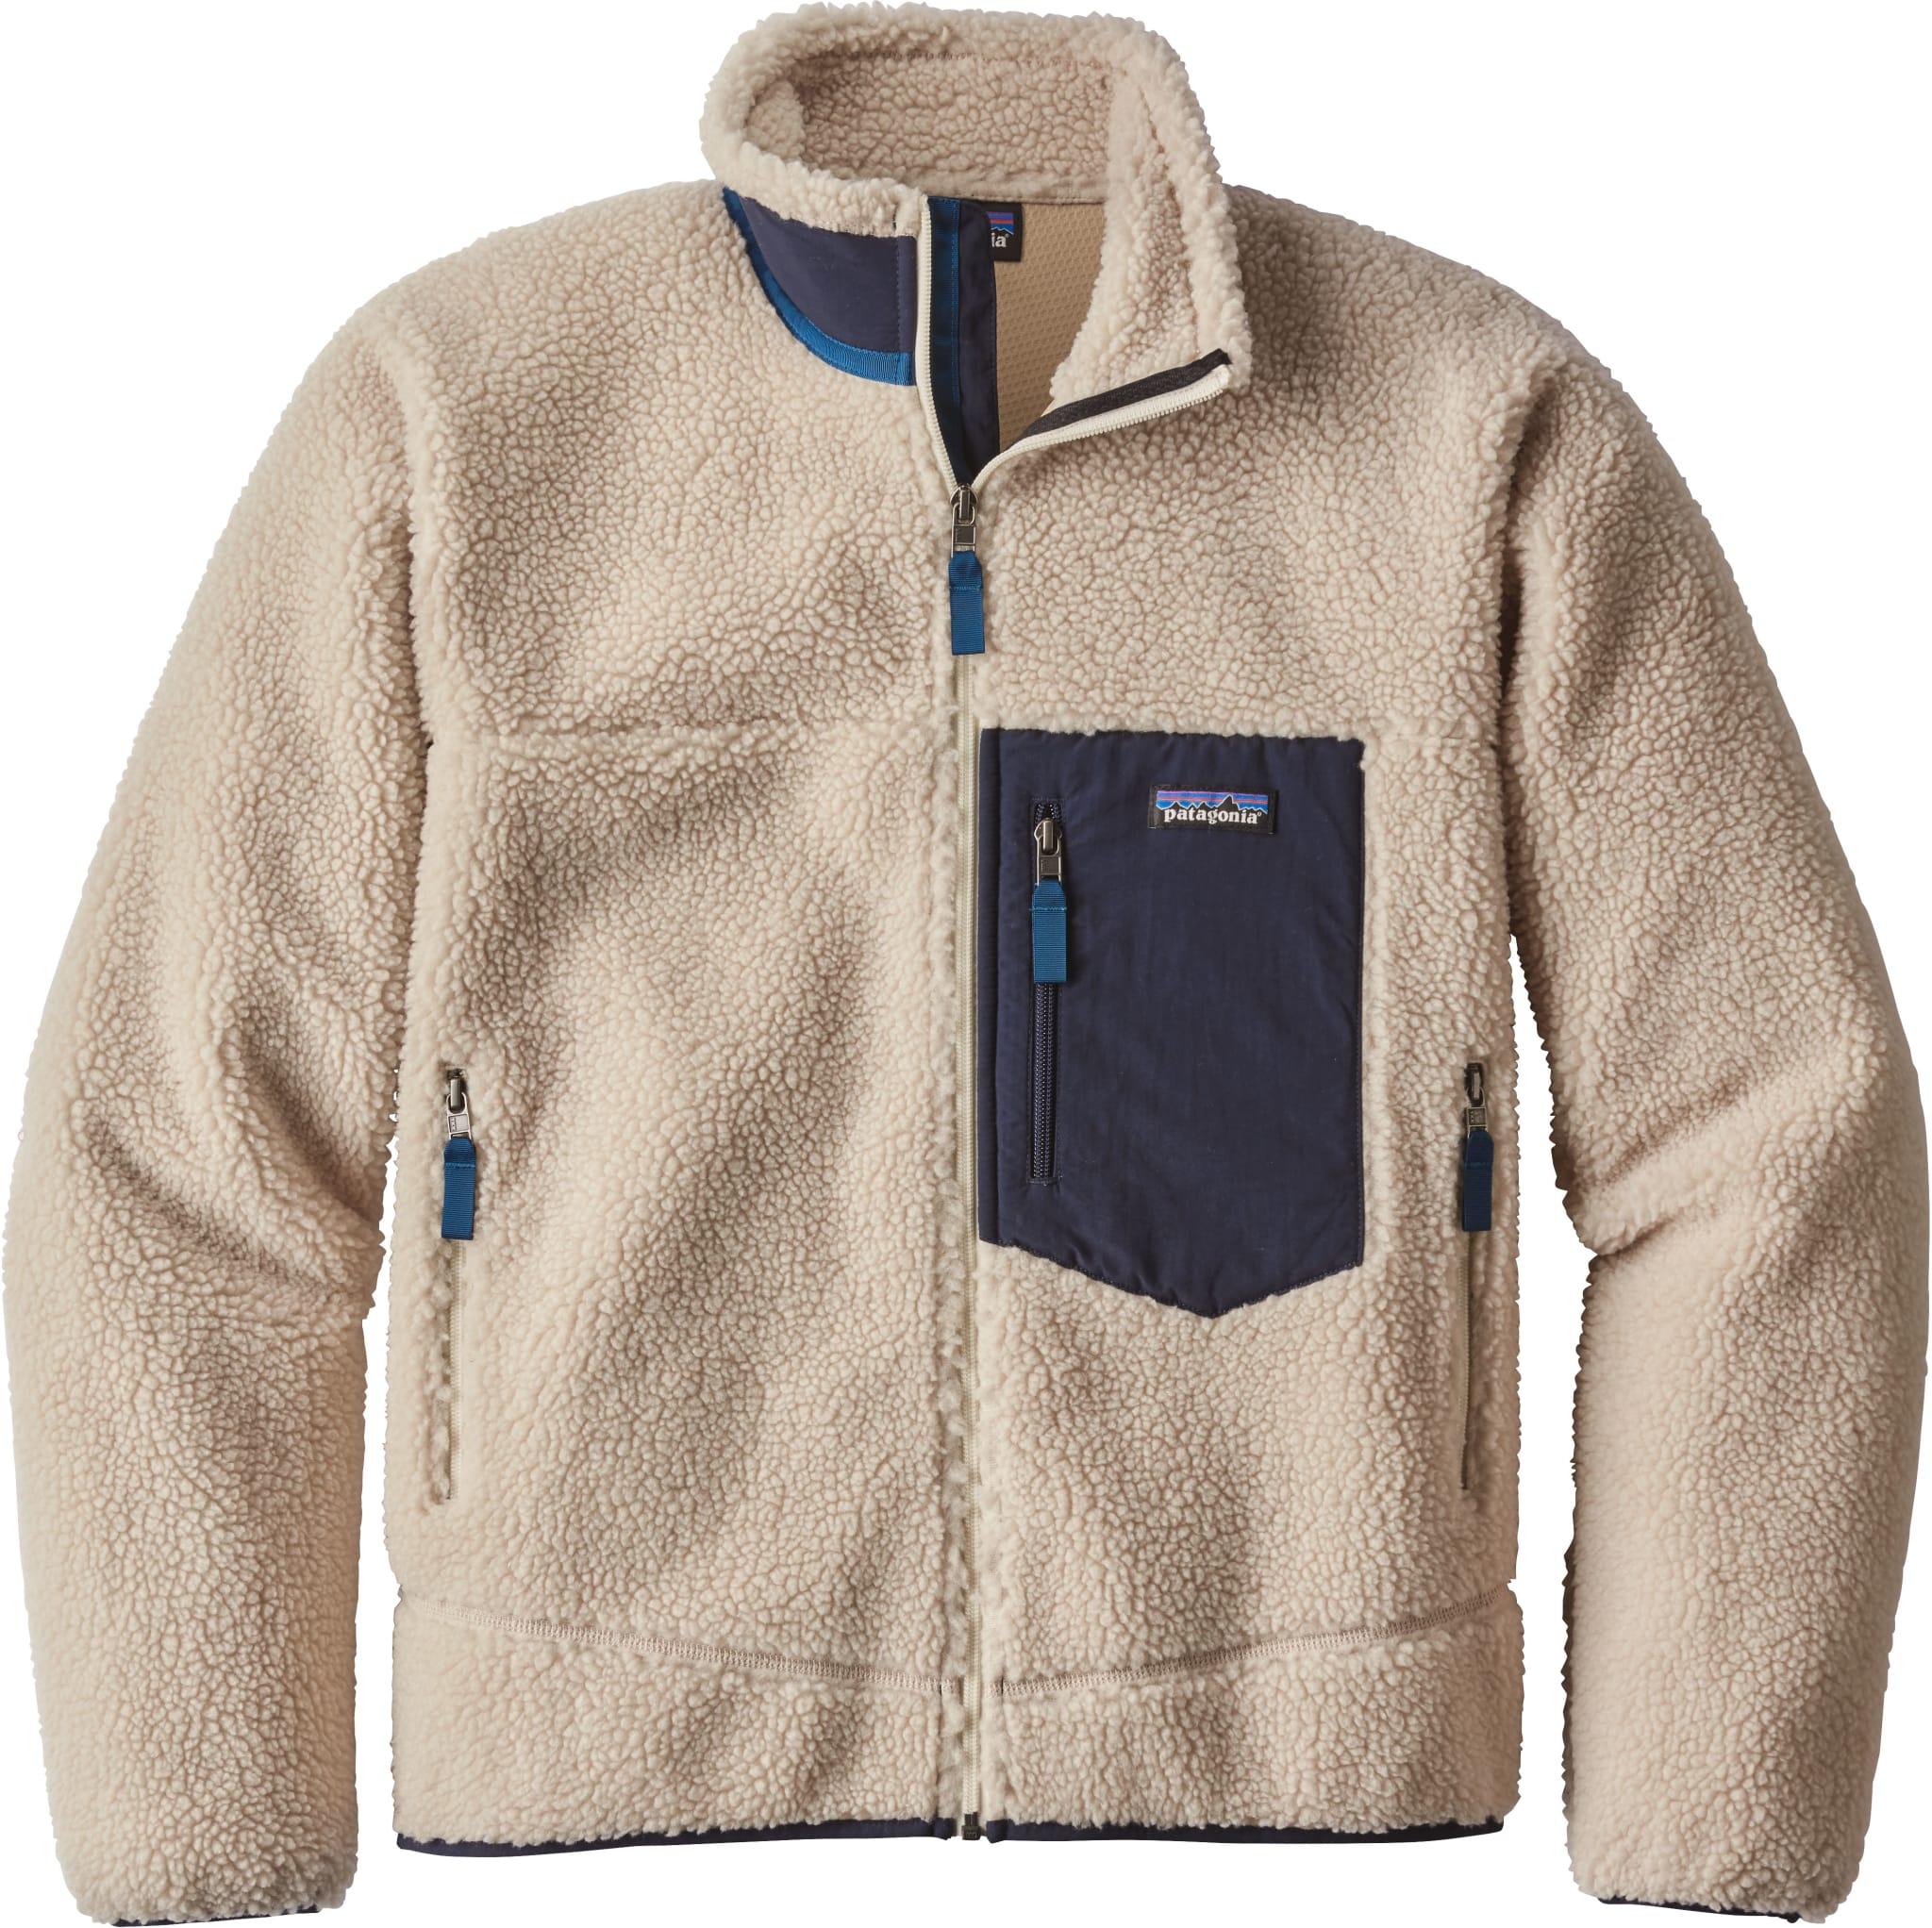 Classic Retro-X Jacket M